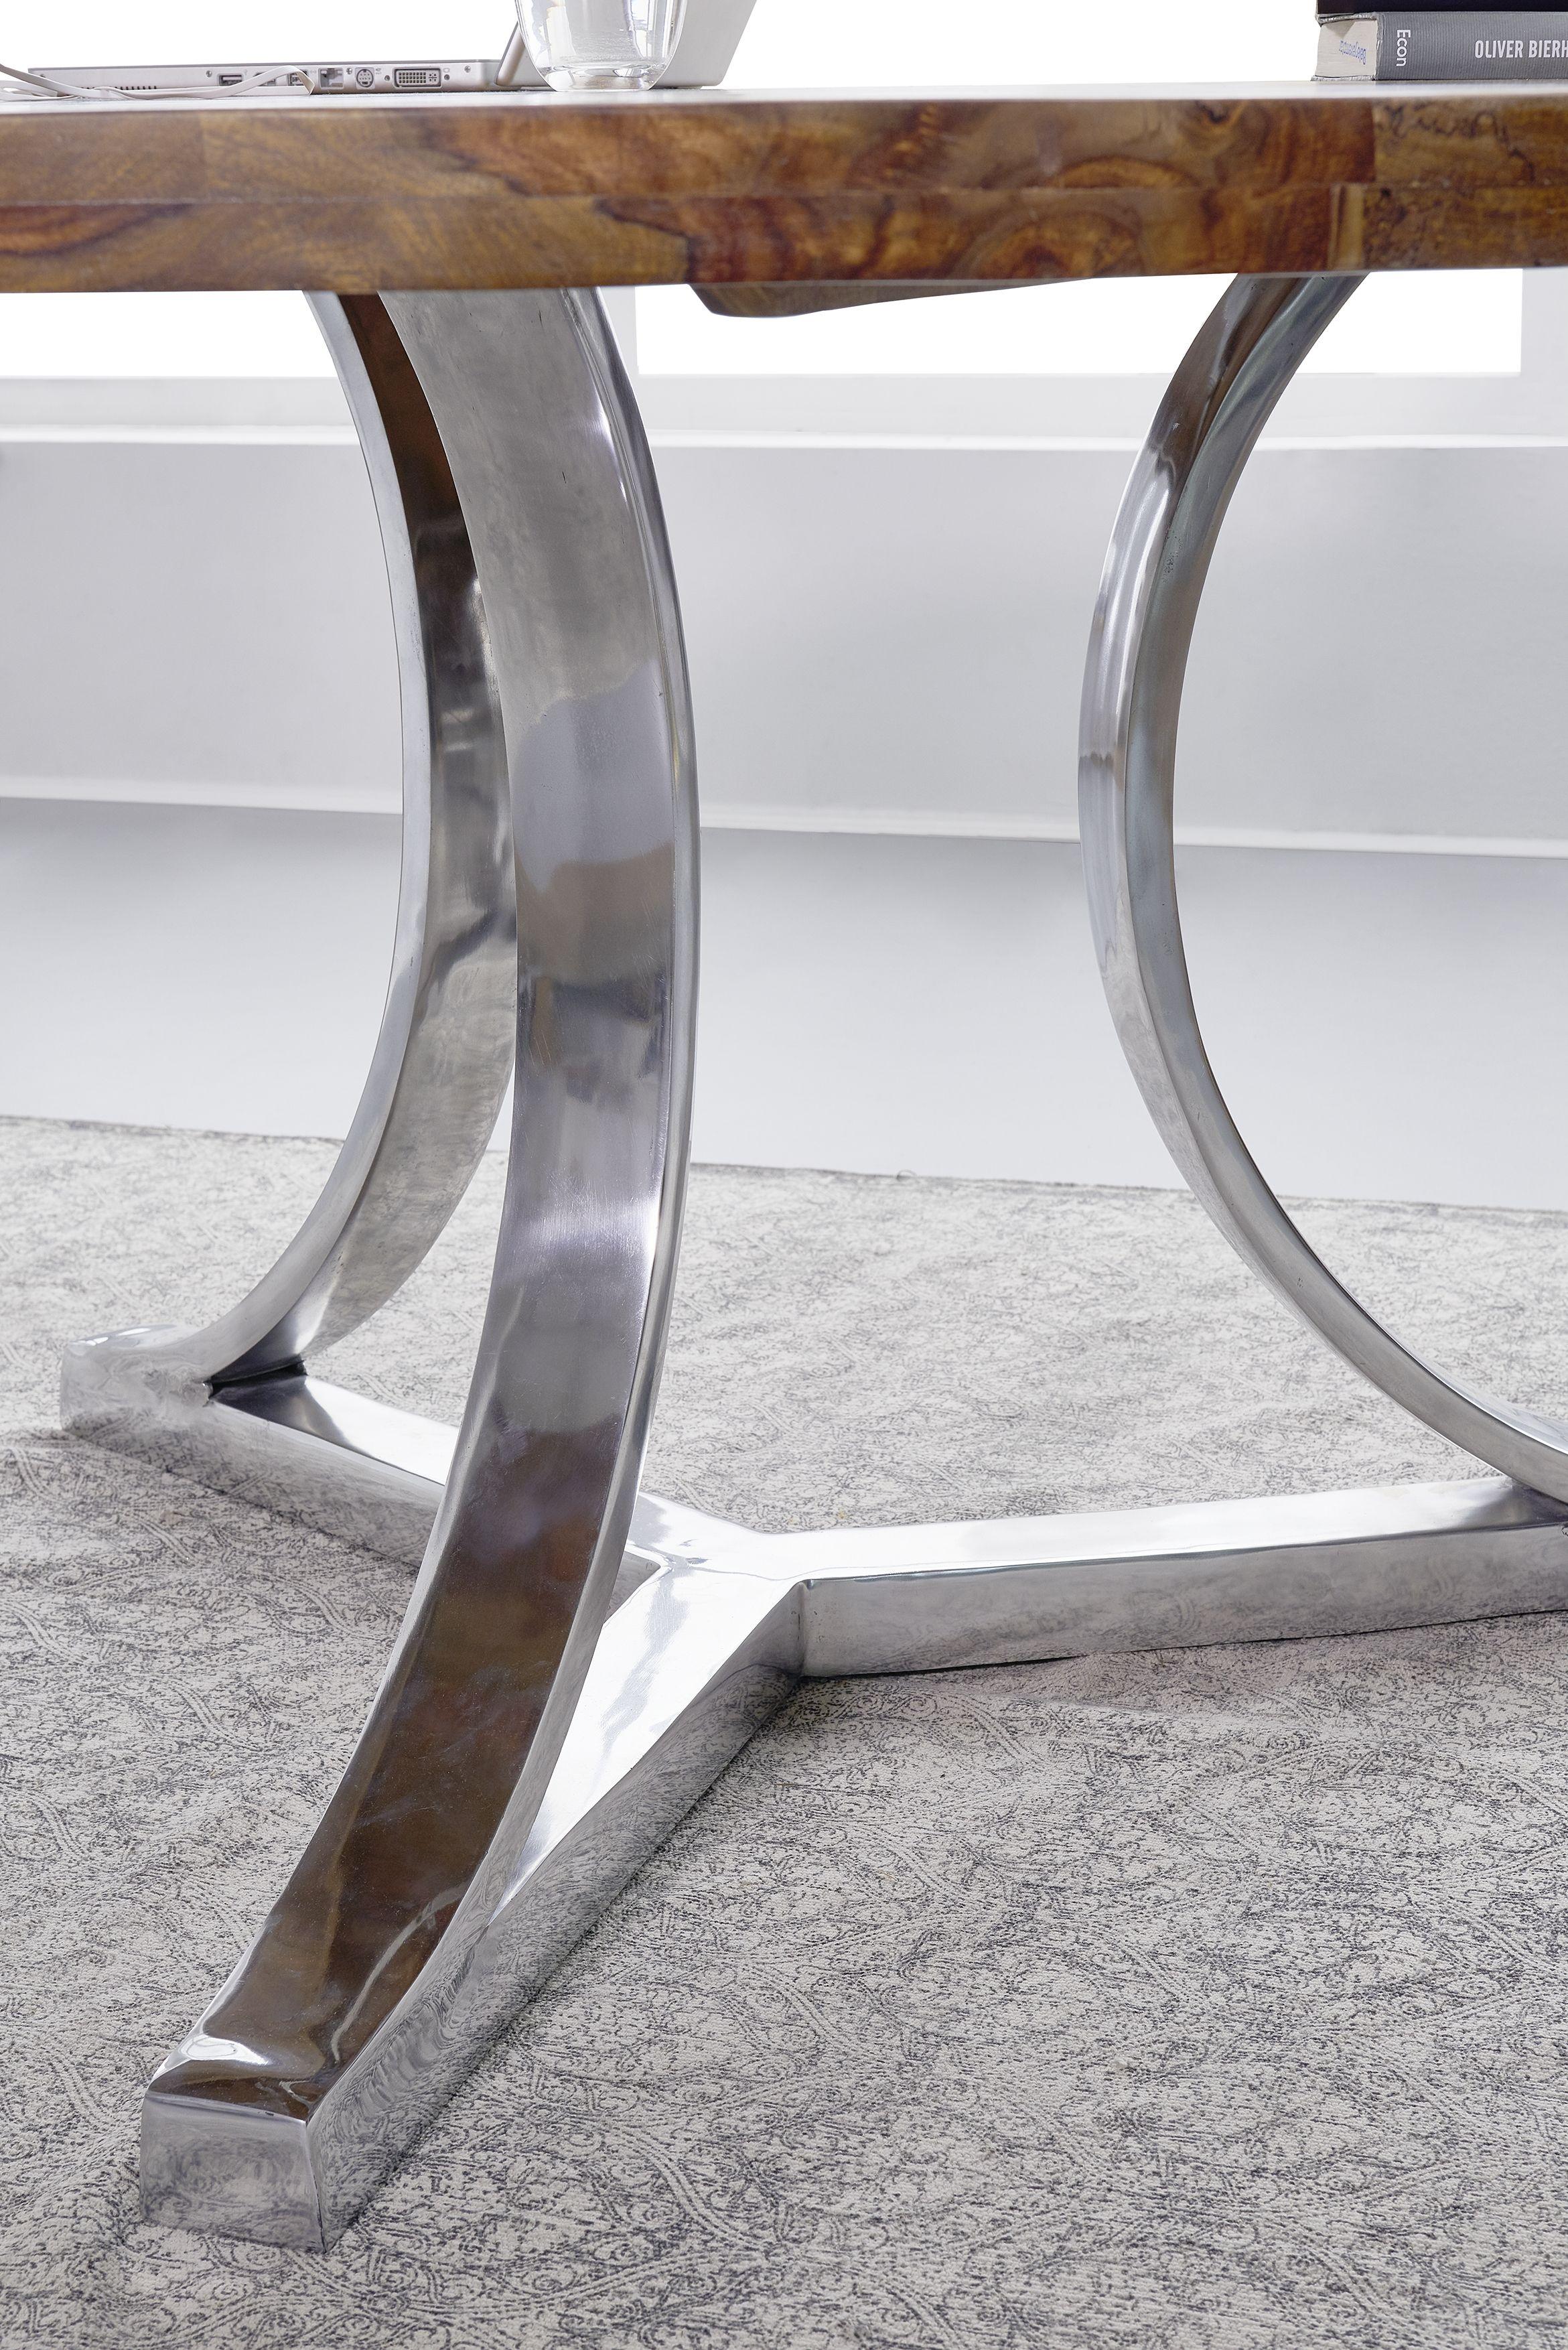 vollholzm bel sheesham palisander lackiert duke in 2019. Black Bedroom Furniture Sets. Home Design Ideas